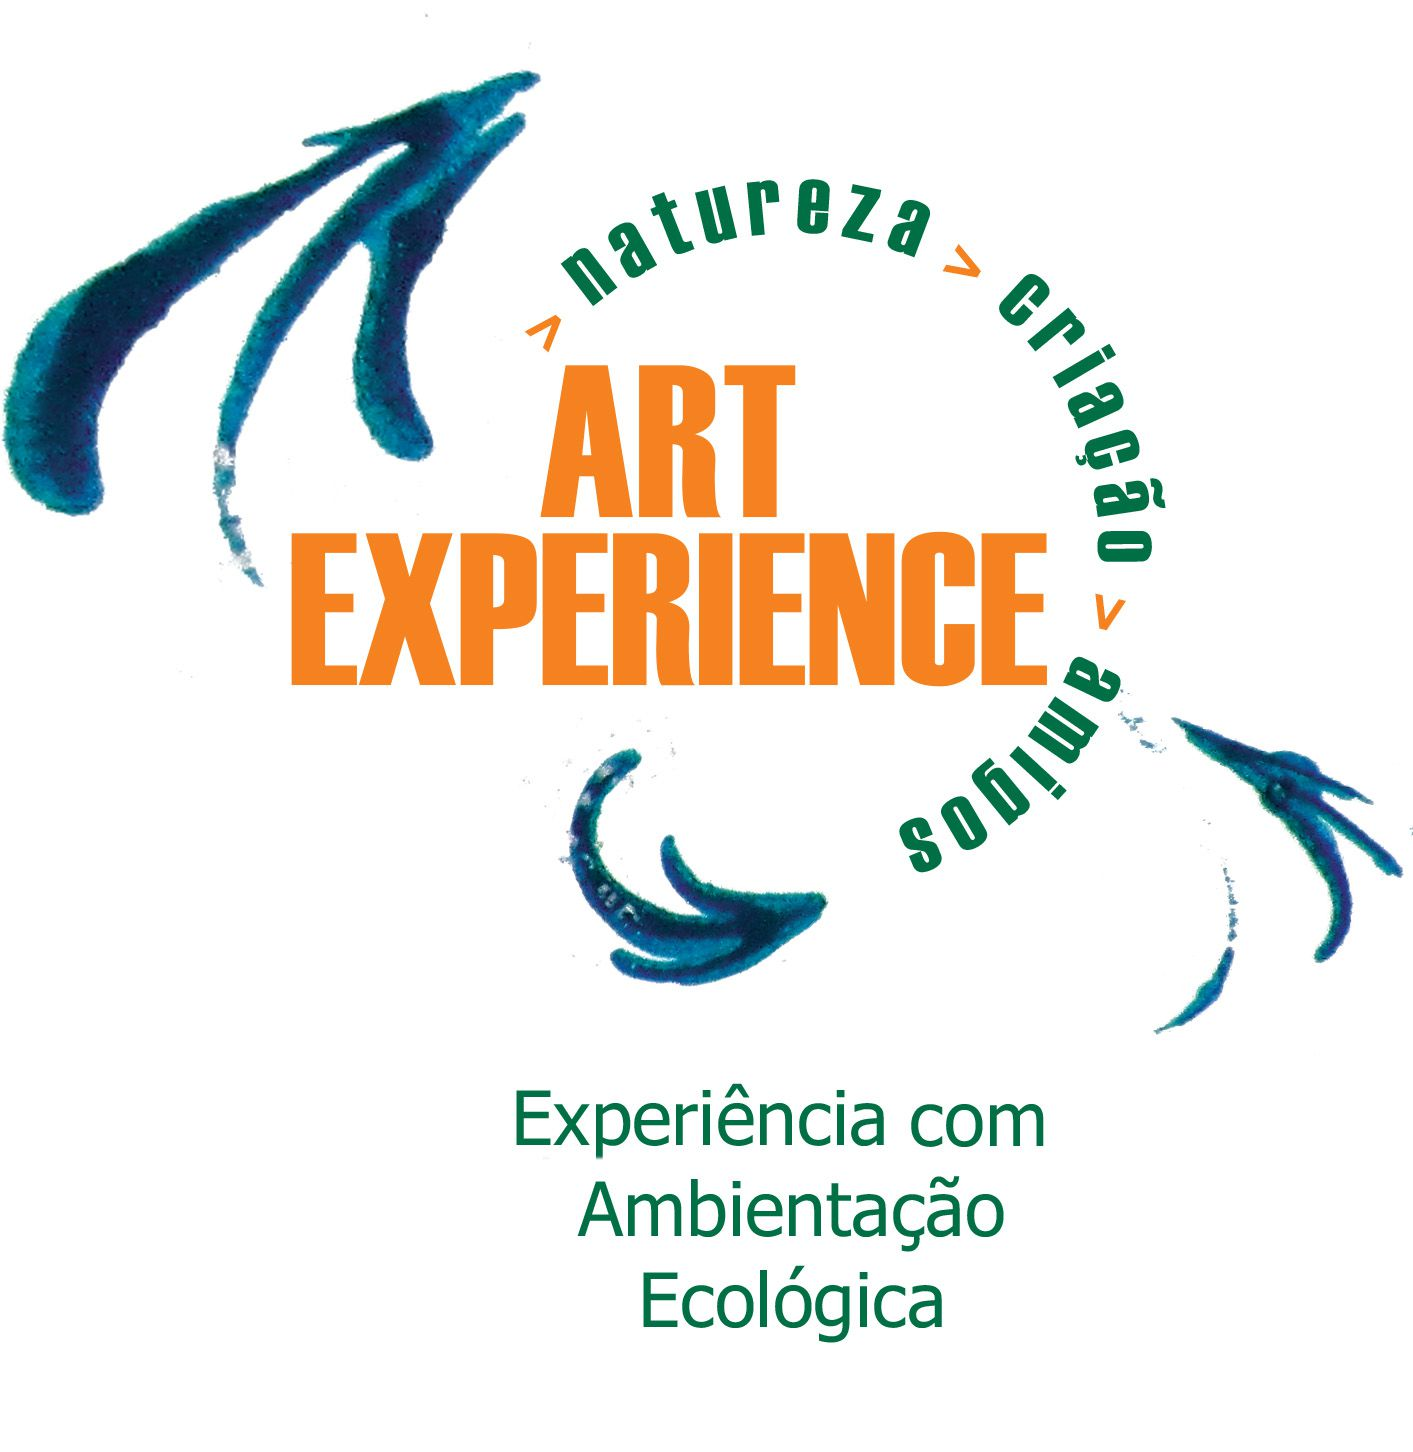 109 - Experiência Artística Sensorial  - 11/09/2019